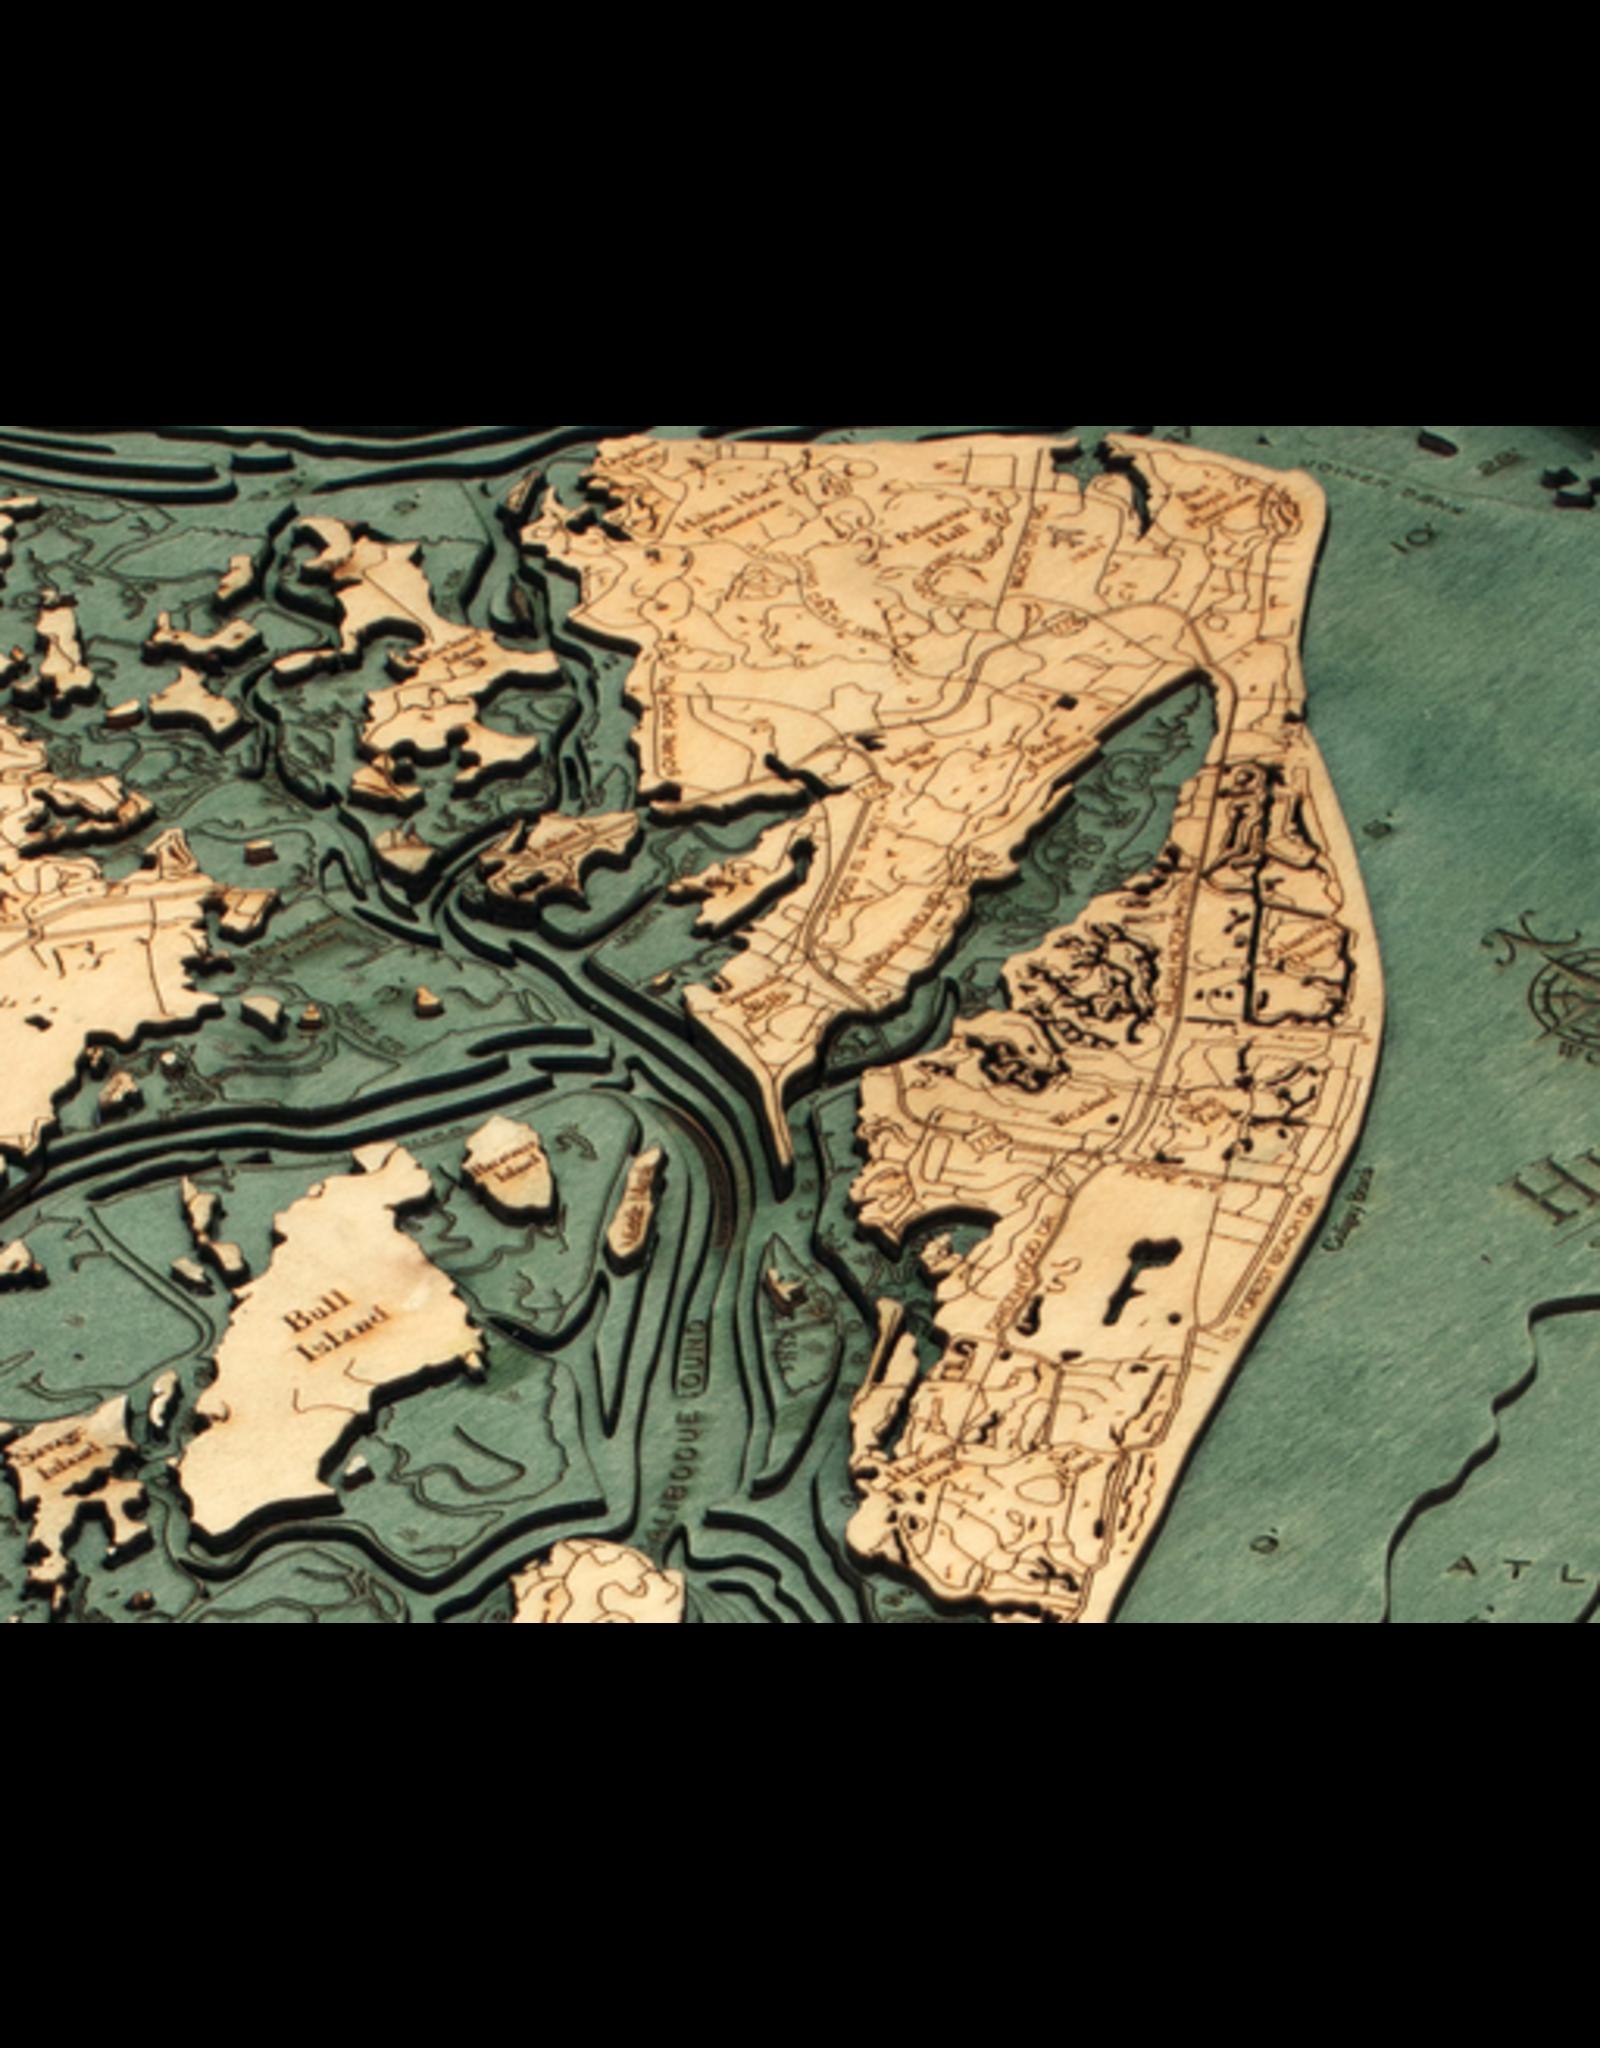 WoodCharts Hilton Head (Bathymetric 3-D Nautical WOODCHART)